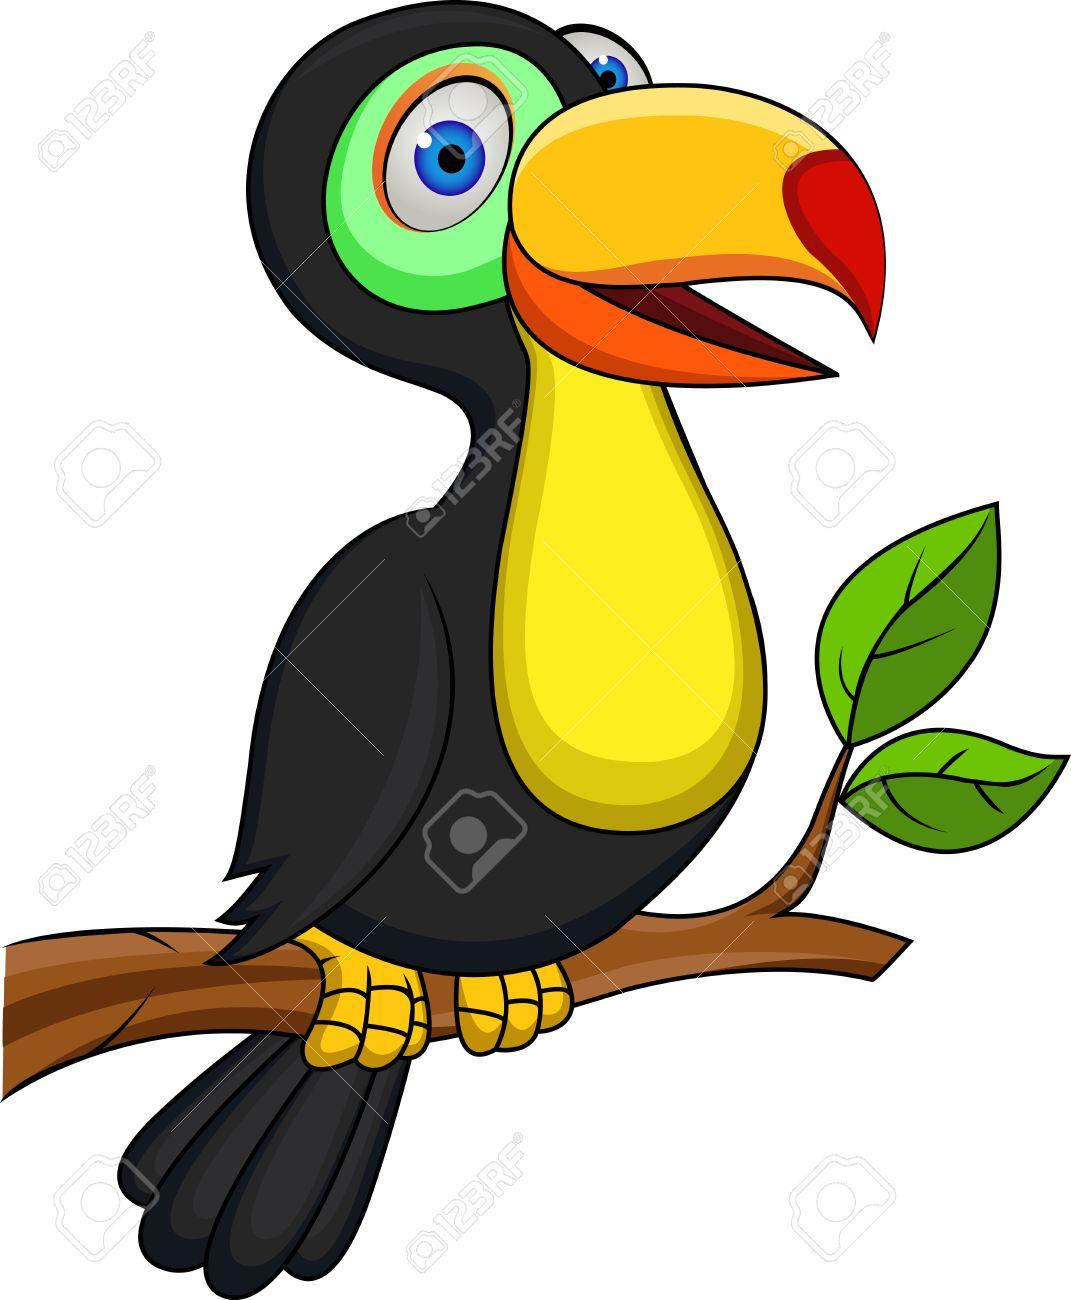 Toucan bird free download. Parrot clipart jungle parrot